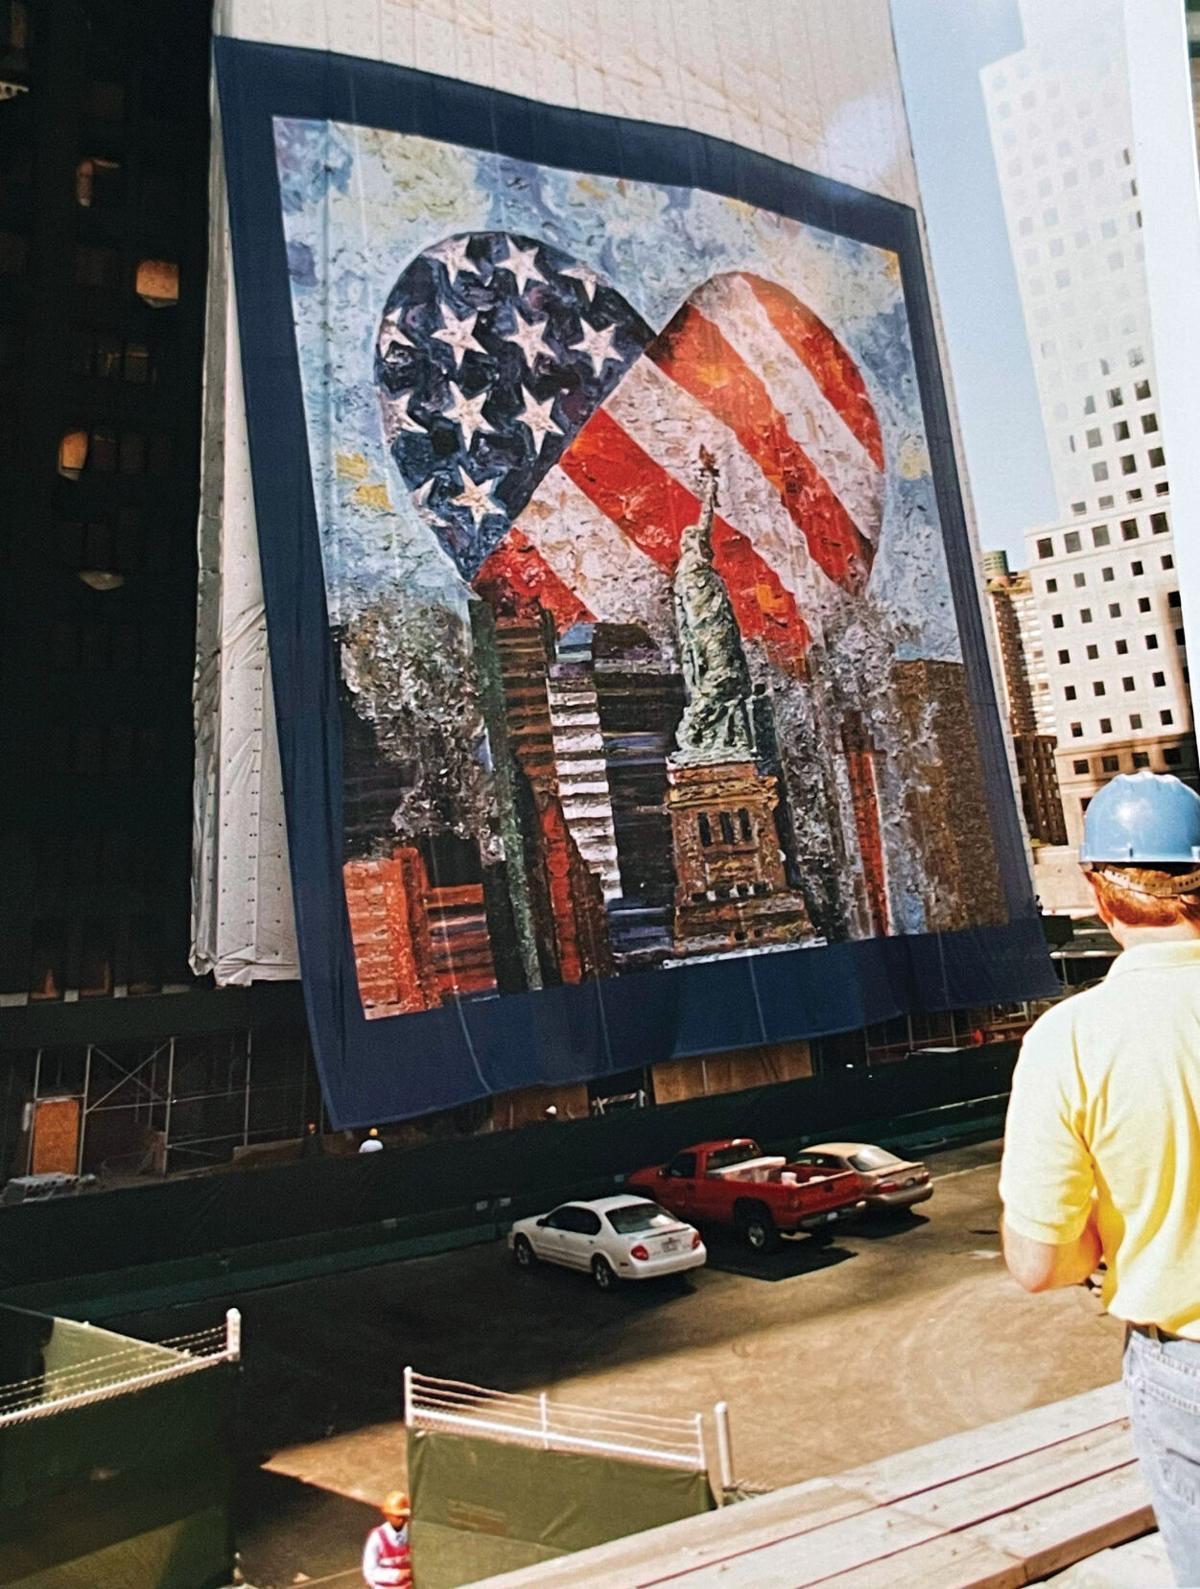 Yakov Mural Being Installed in New York